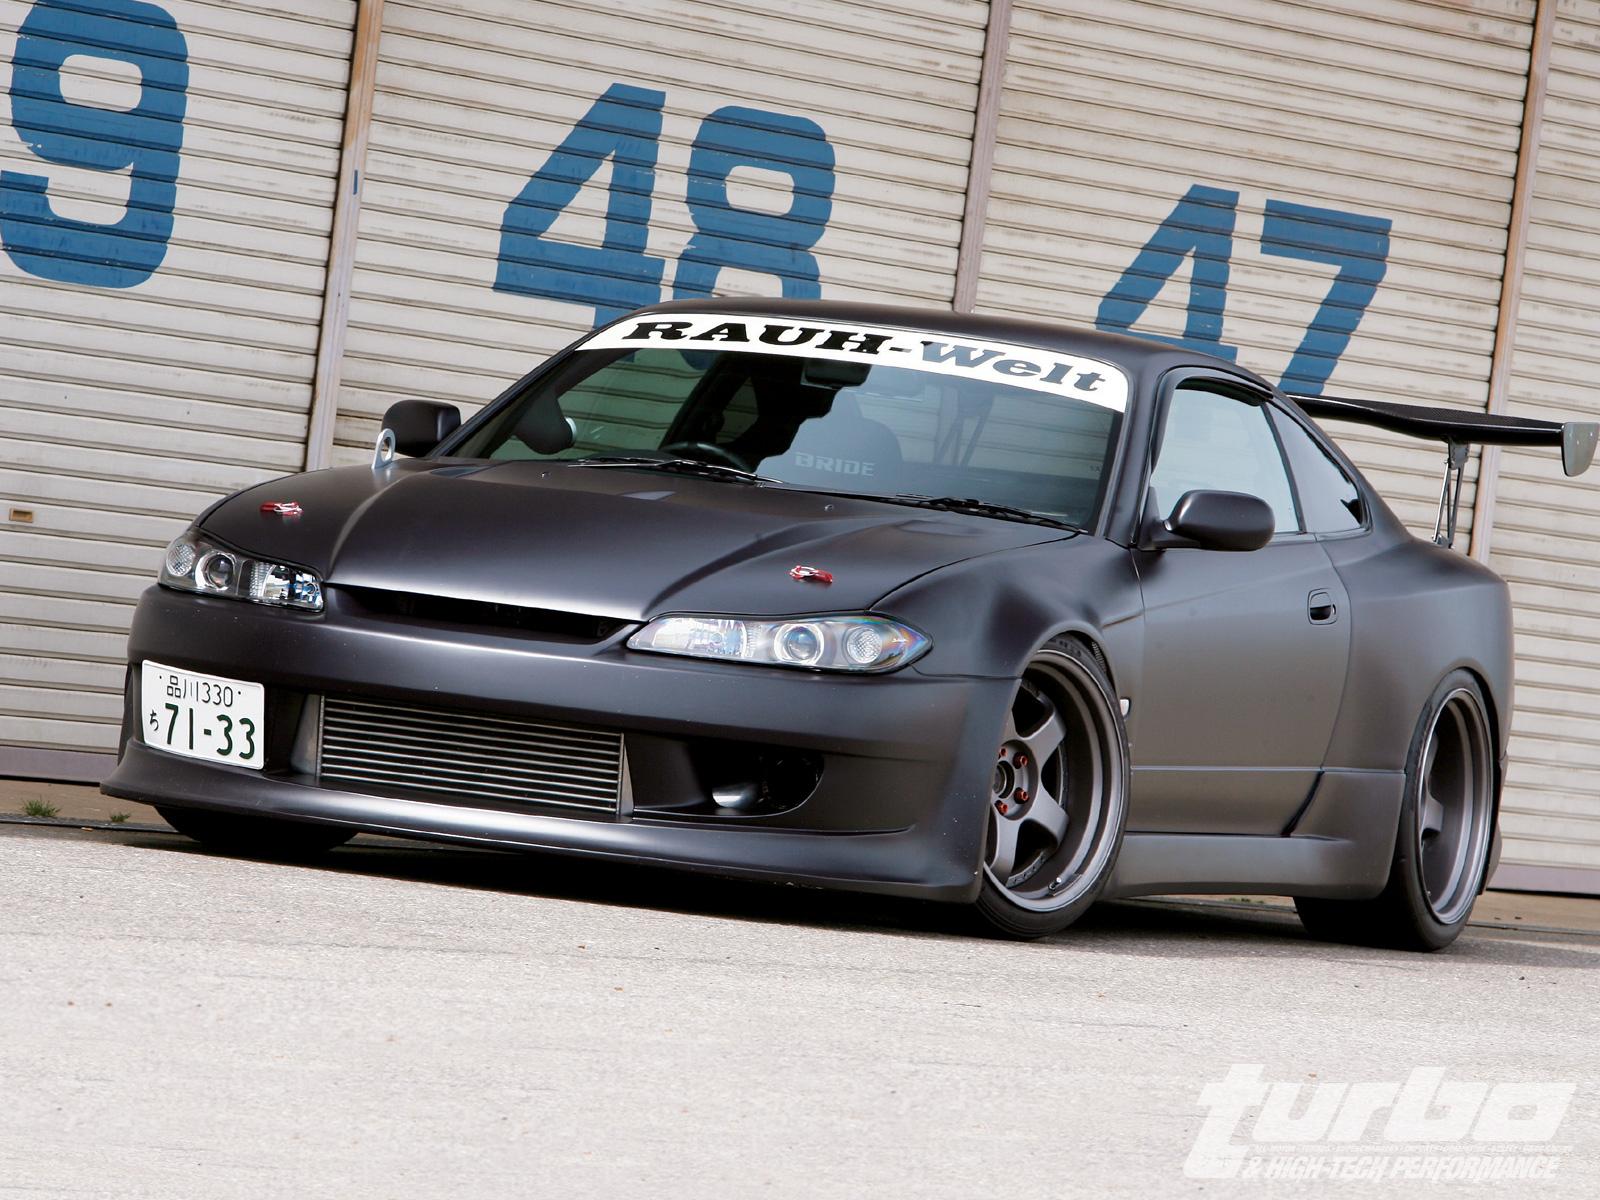 Nissan Silvia Blue Nissan Silvia Picture 2970